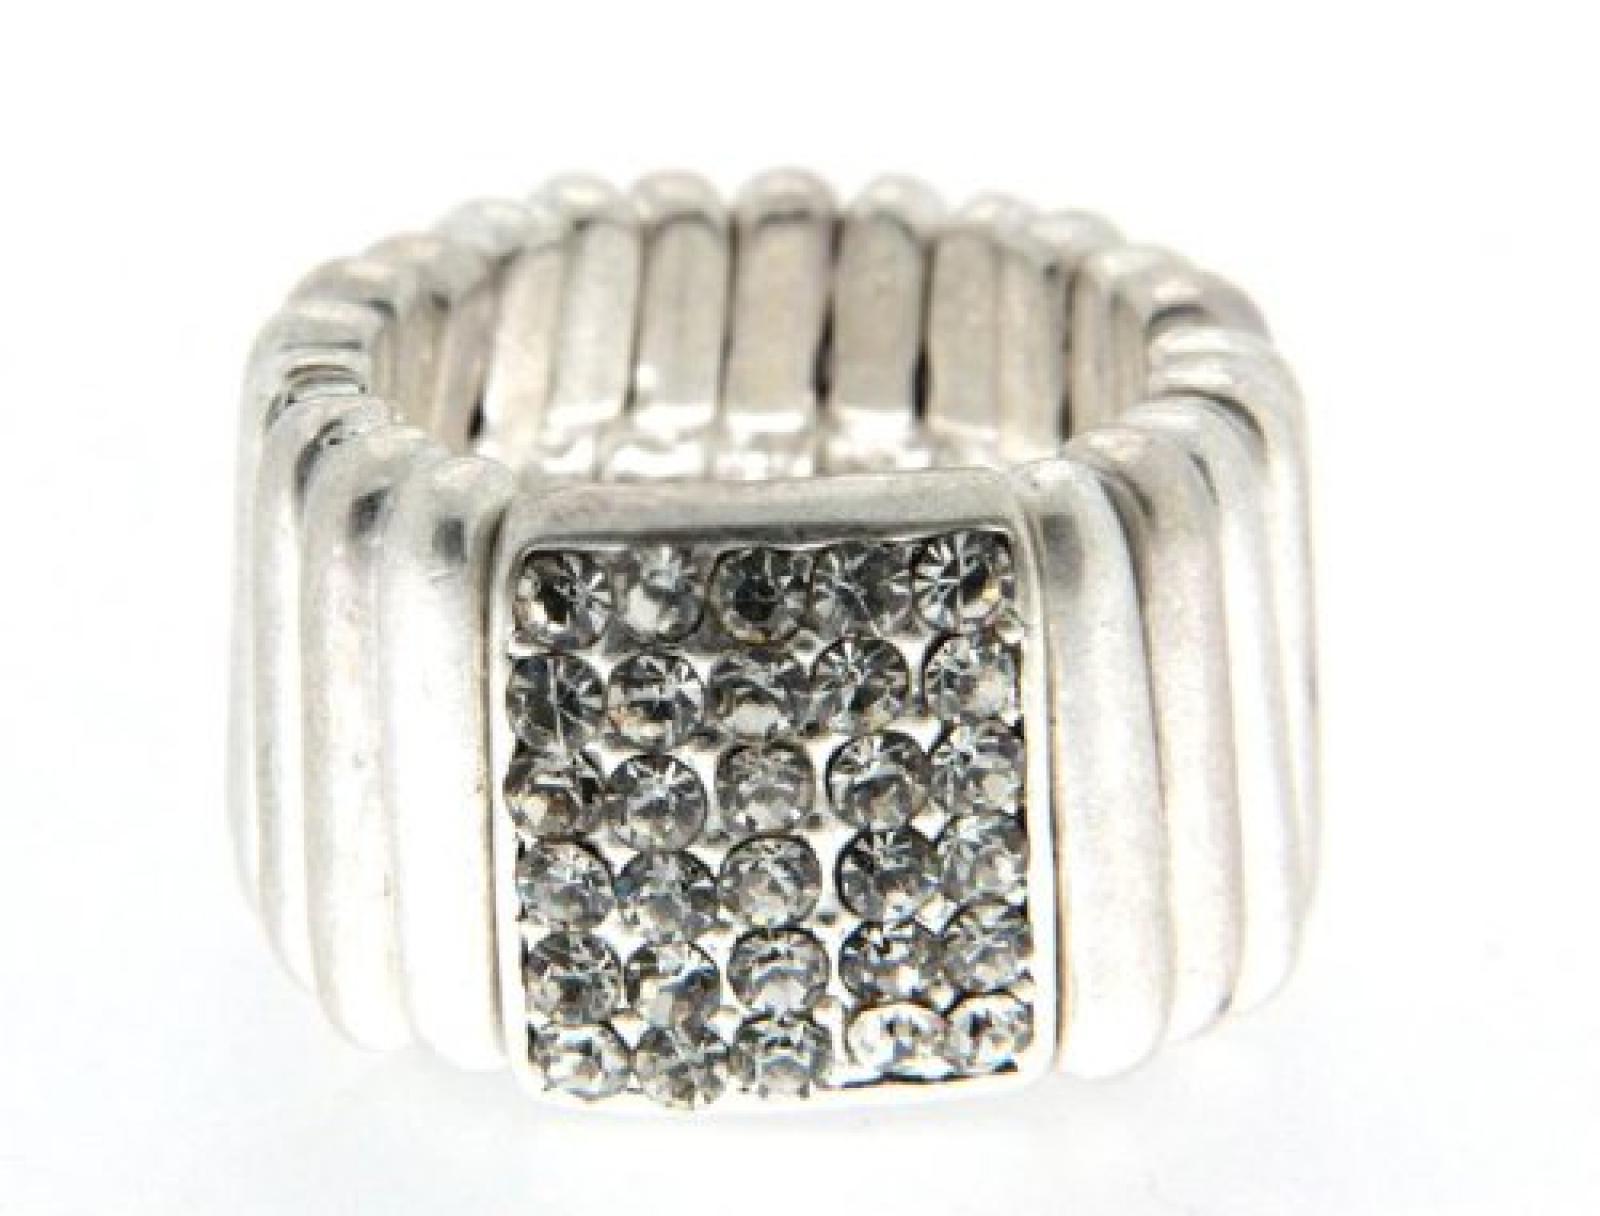 Sweet Deluxe Damen-Ring Messing sweet deluxe Damen Strechring Barock 4 silber/kristall 02763 Gr. 2763